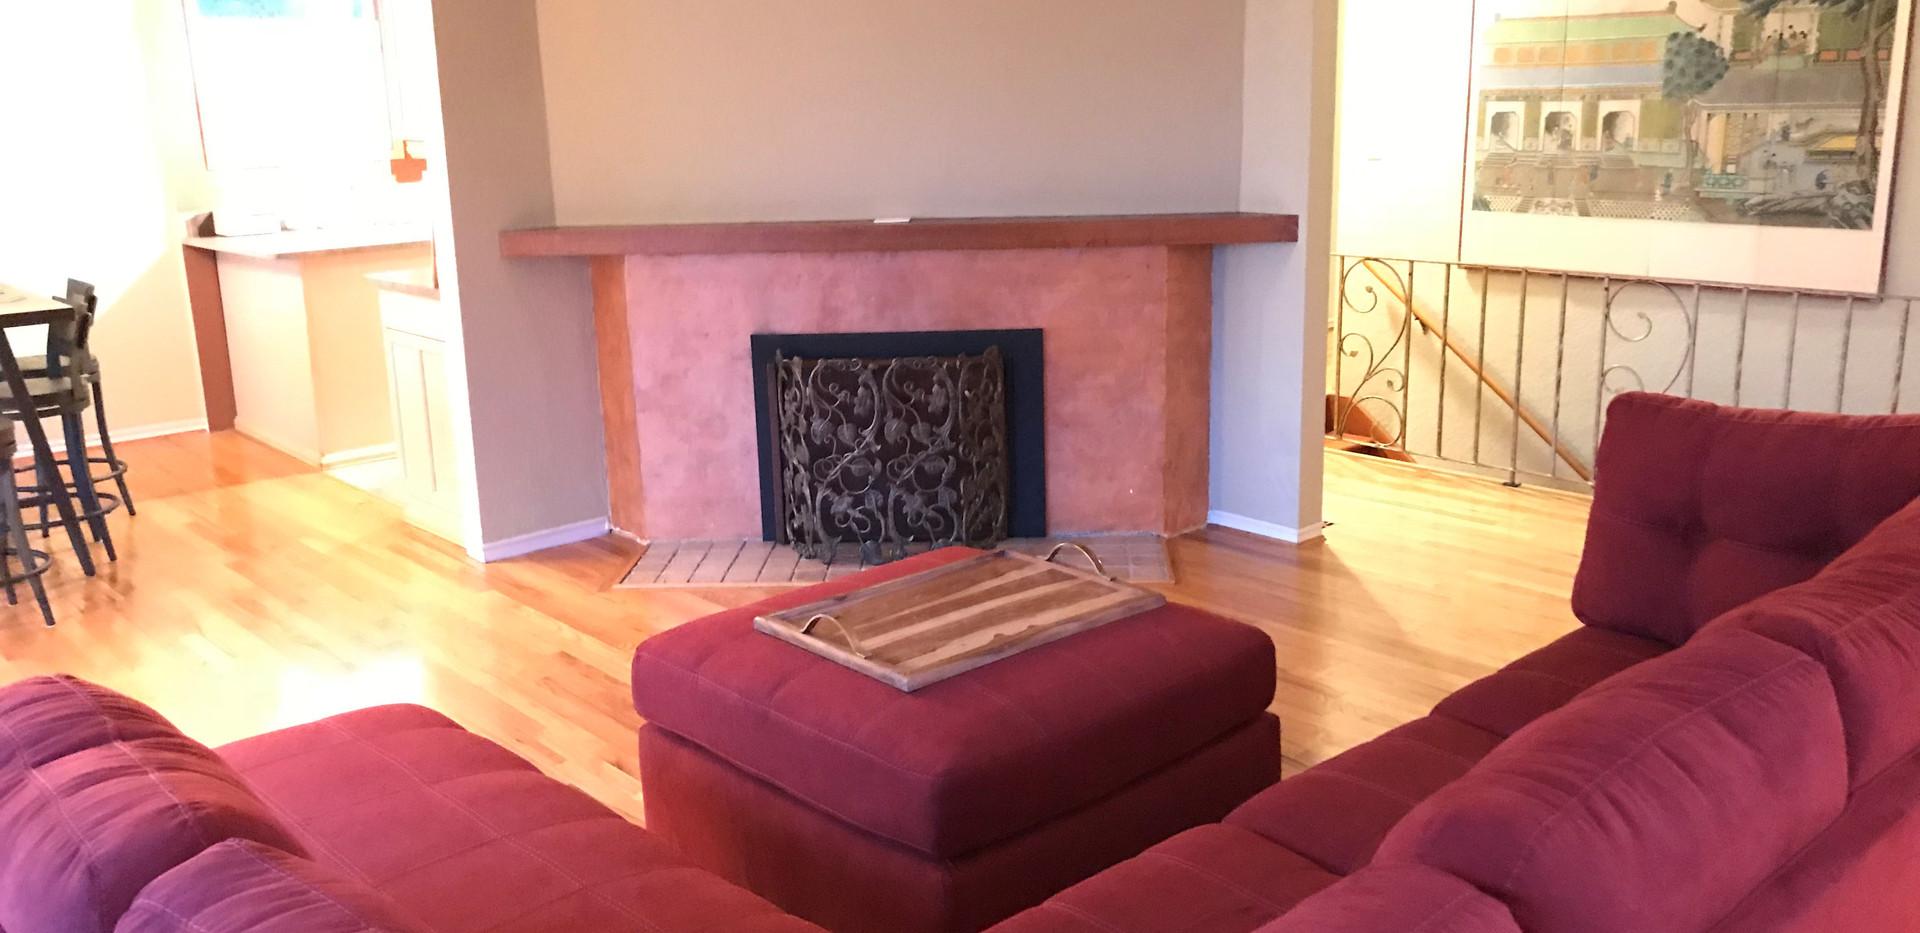 Living room - fireplace.jpg